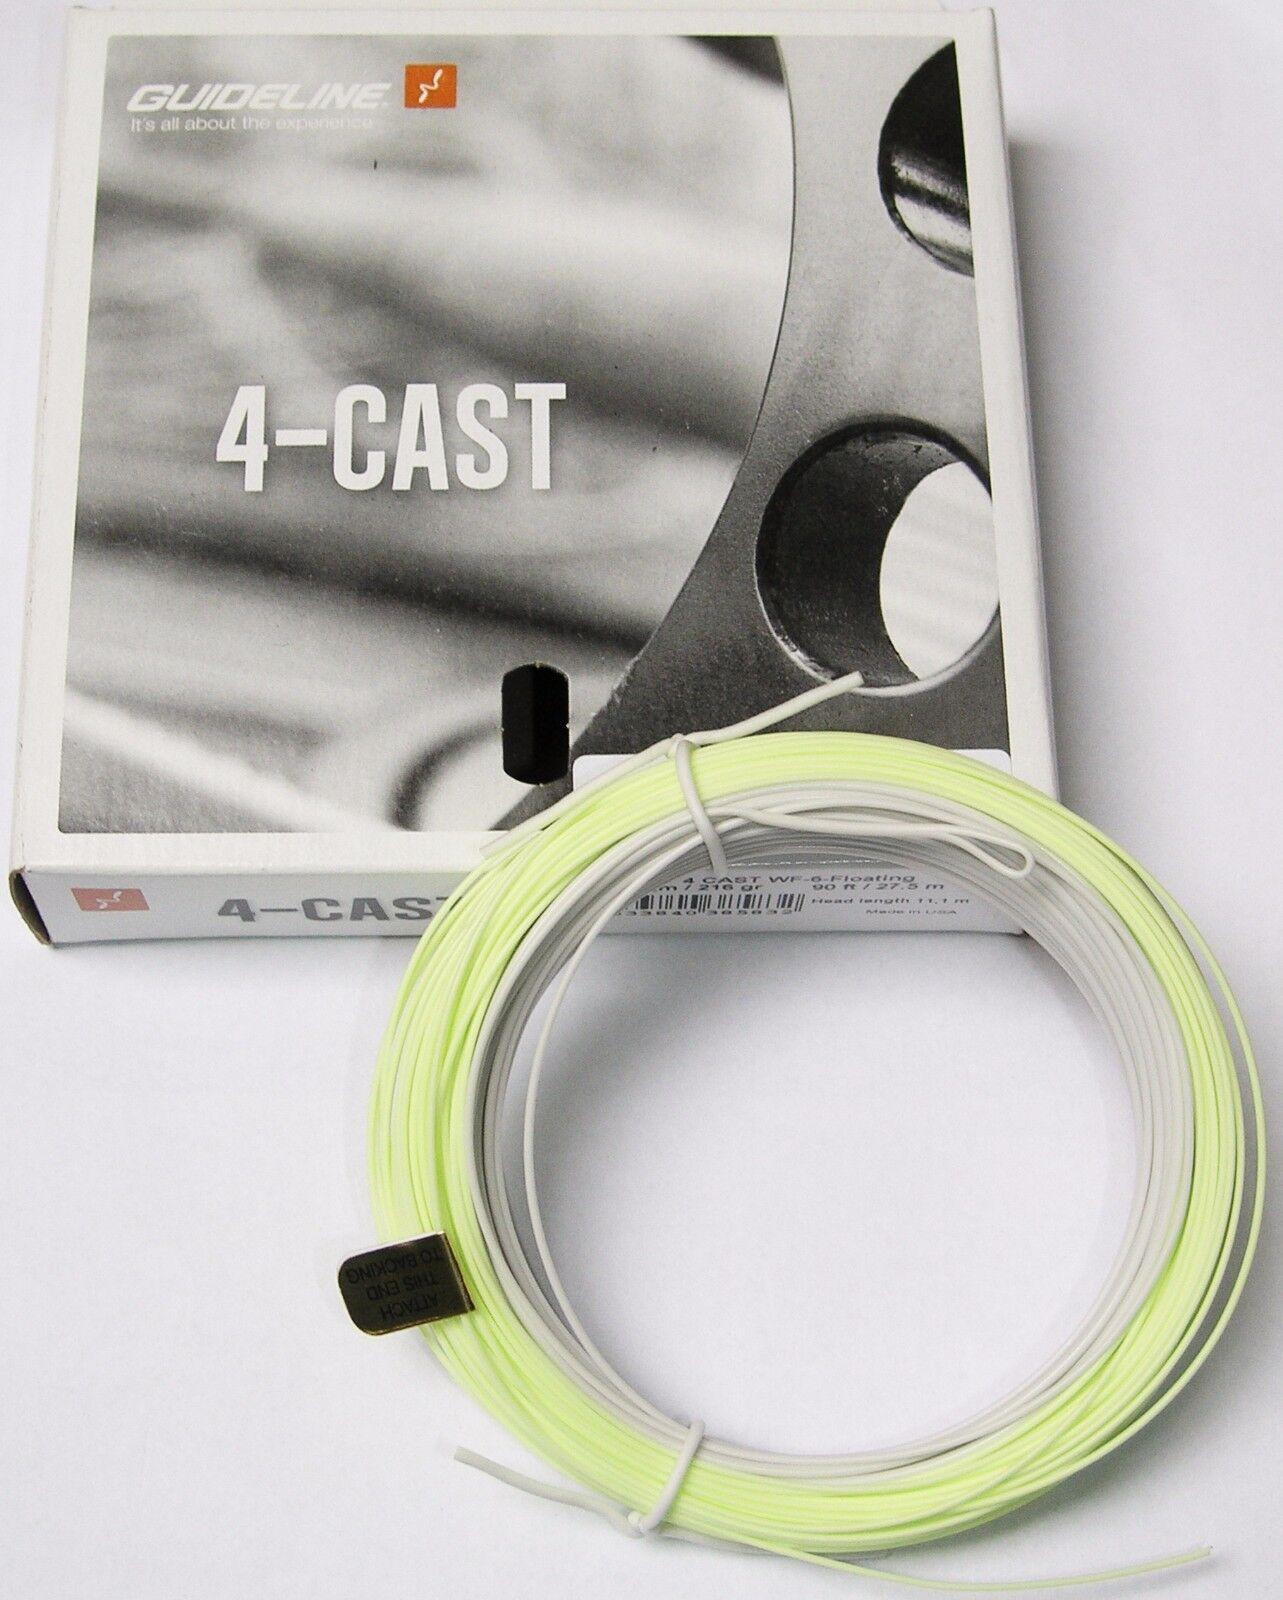 1Guideline 4Cast WF-5-Floating - für sanfte - Präsentation - sanfte 11-m-Keule - NEU 9ac95d